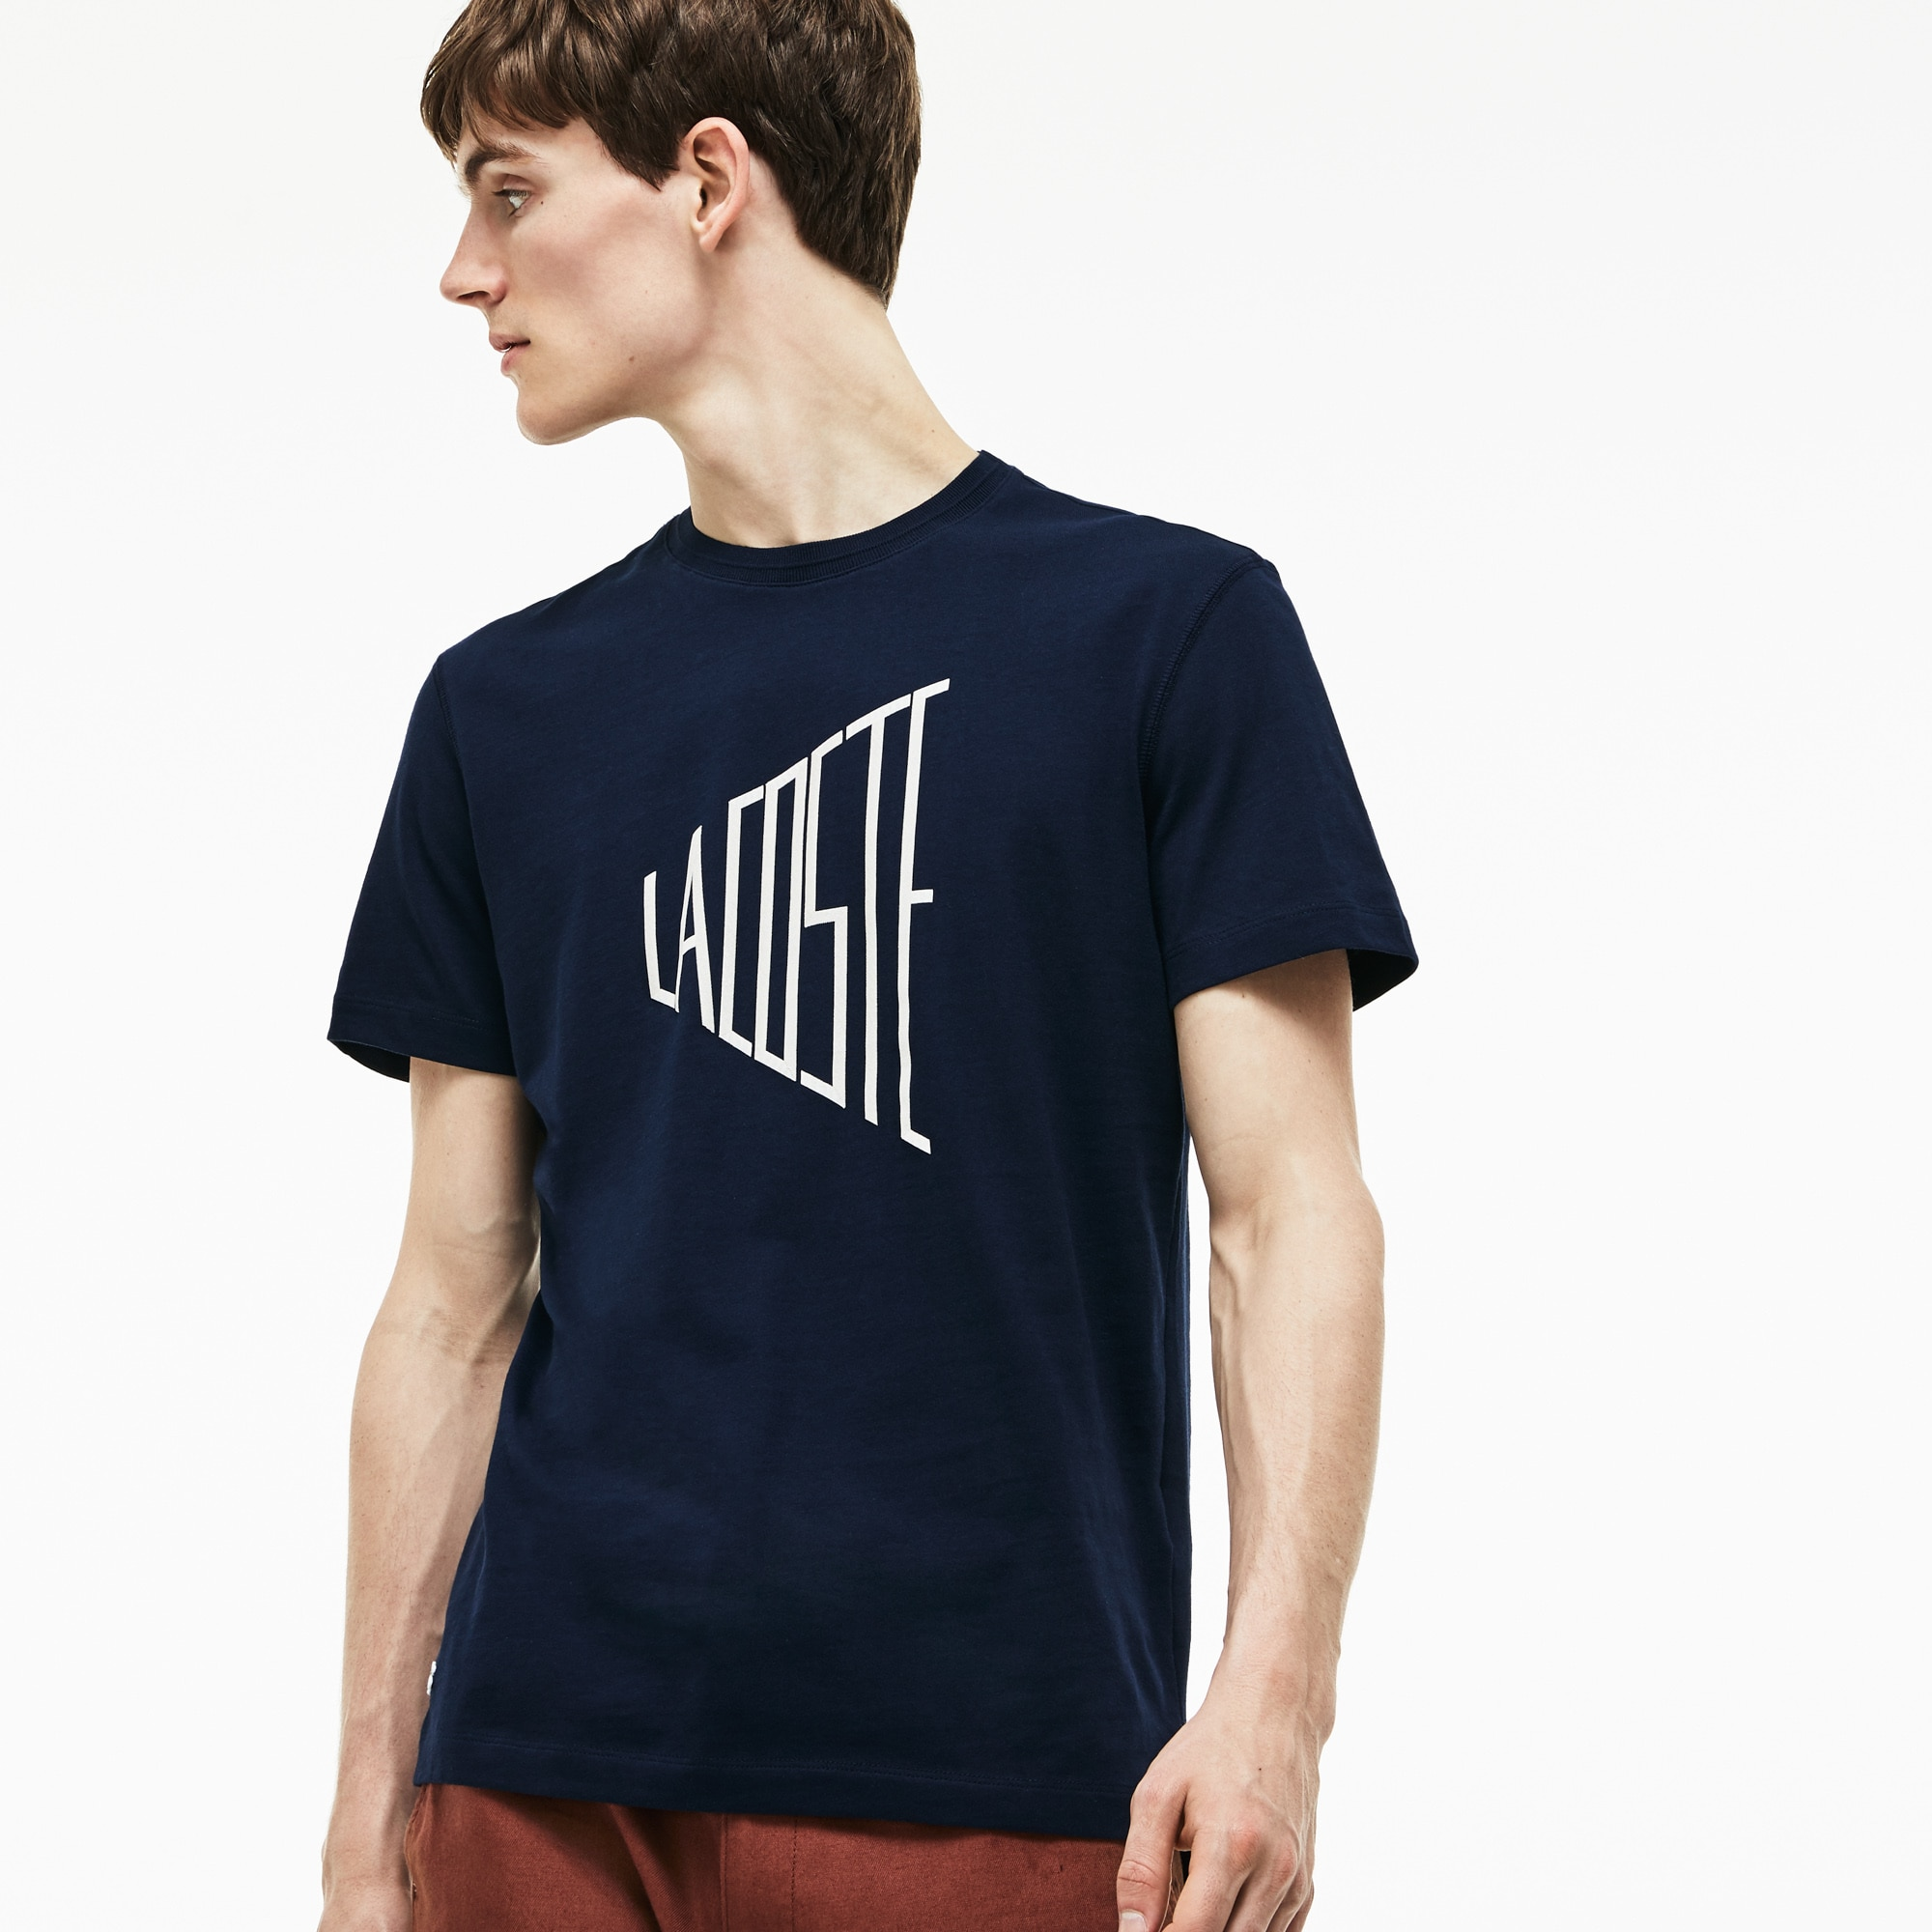 Men's Crew Neck Lettering T-Shirt